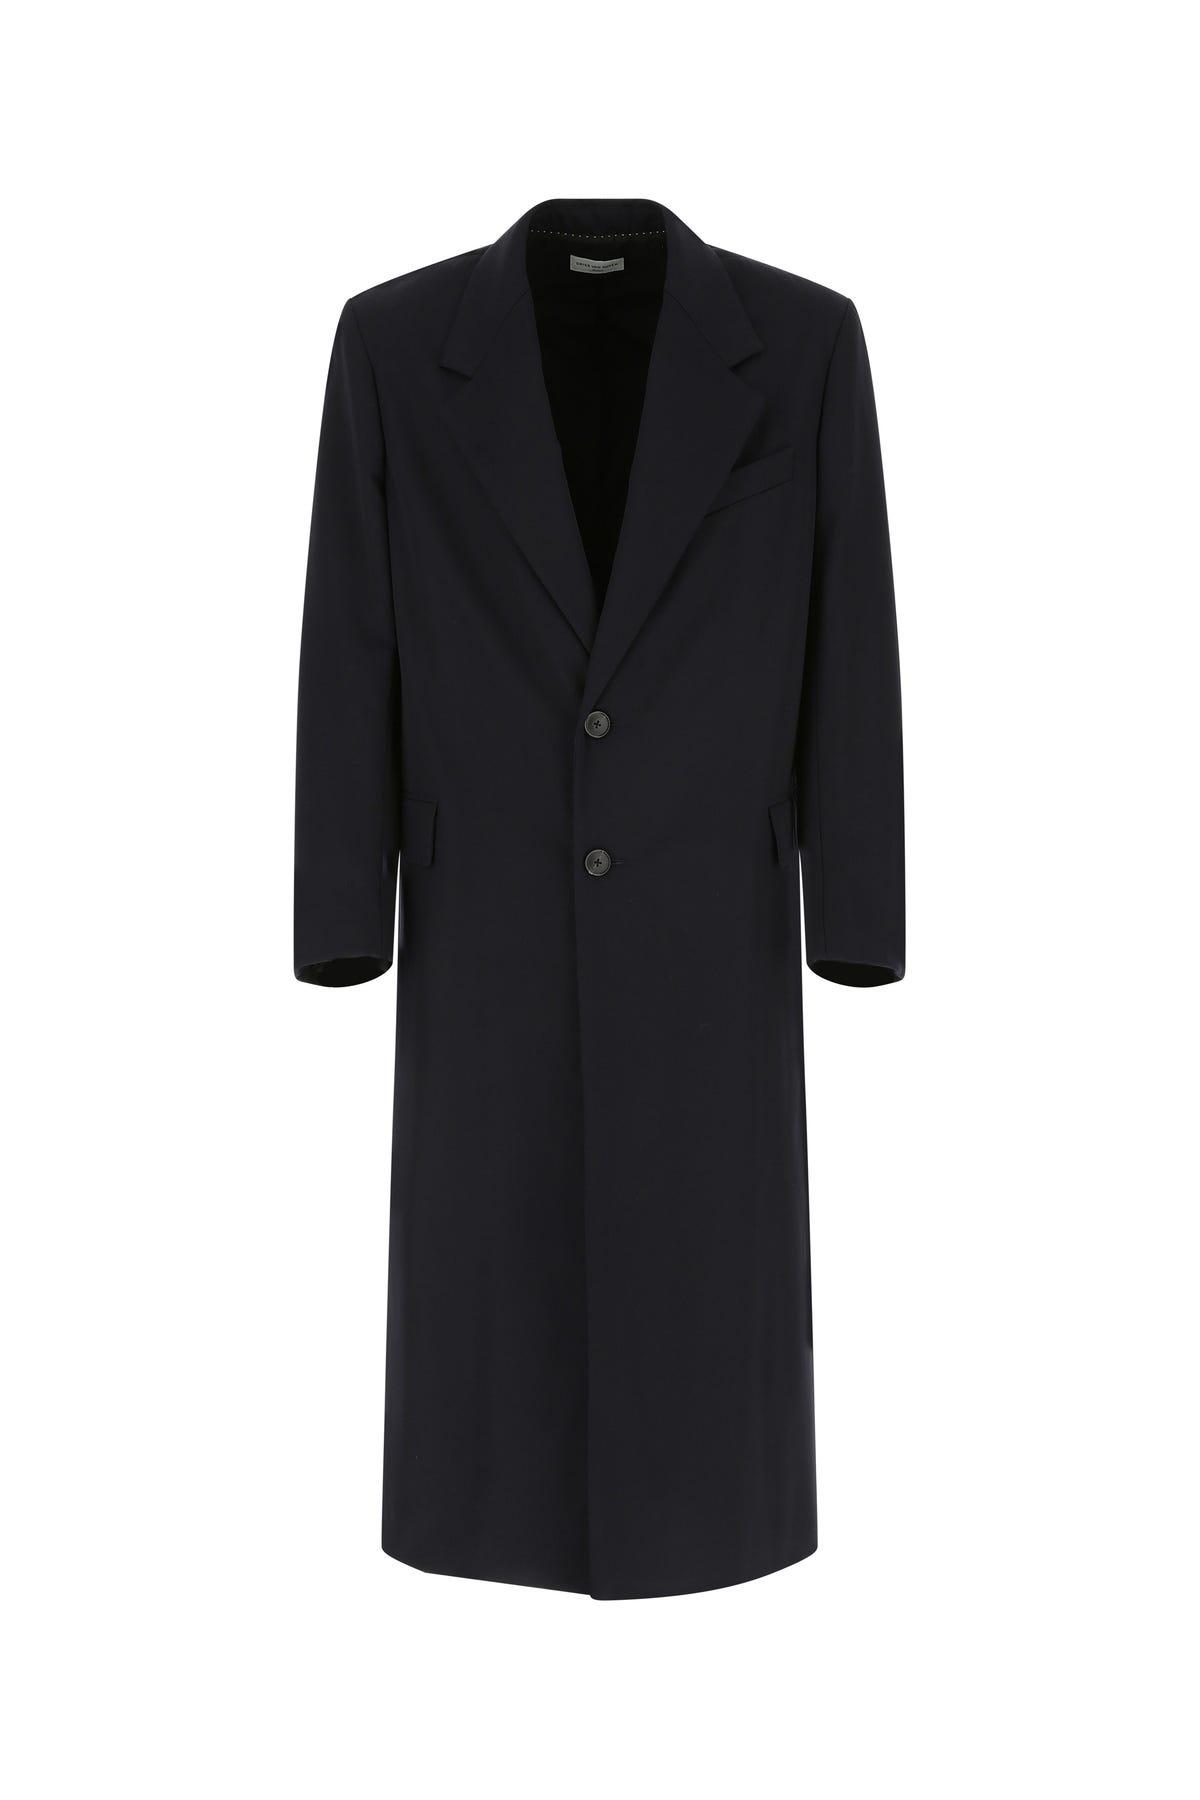 Dries Van Noten Midnight Blue Wool Coat  Blue  Uomo L